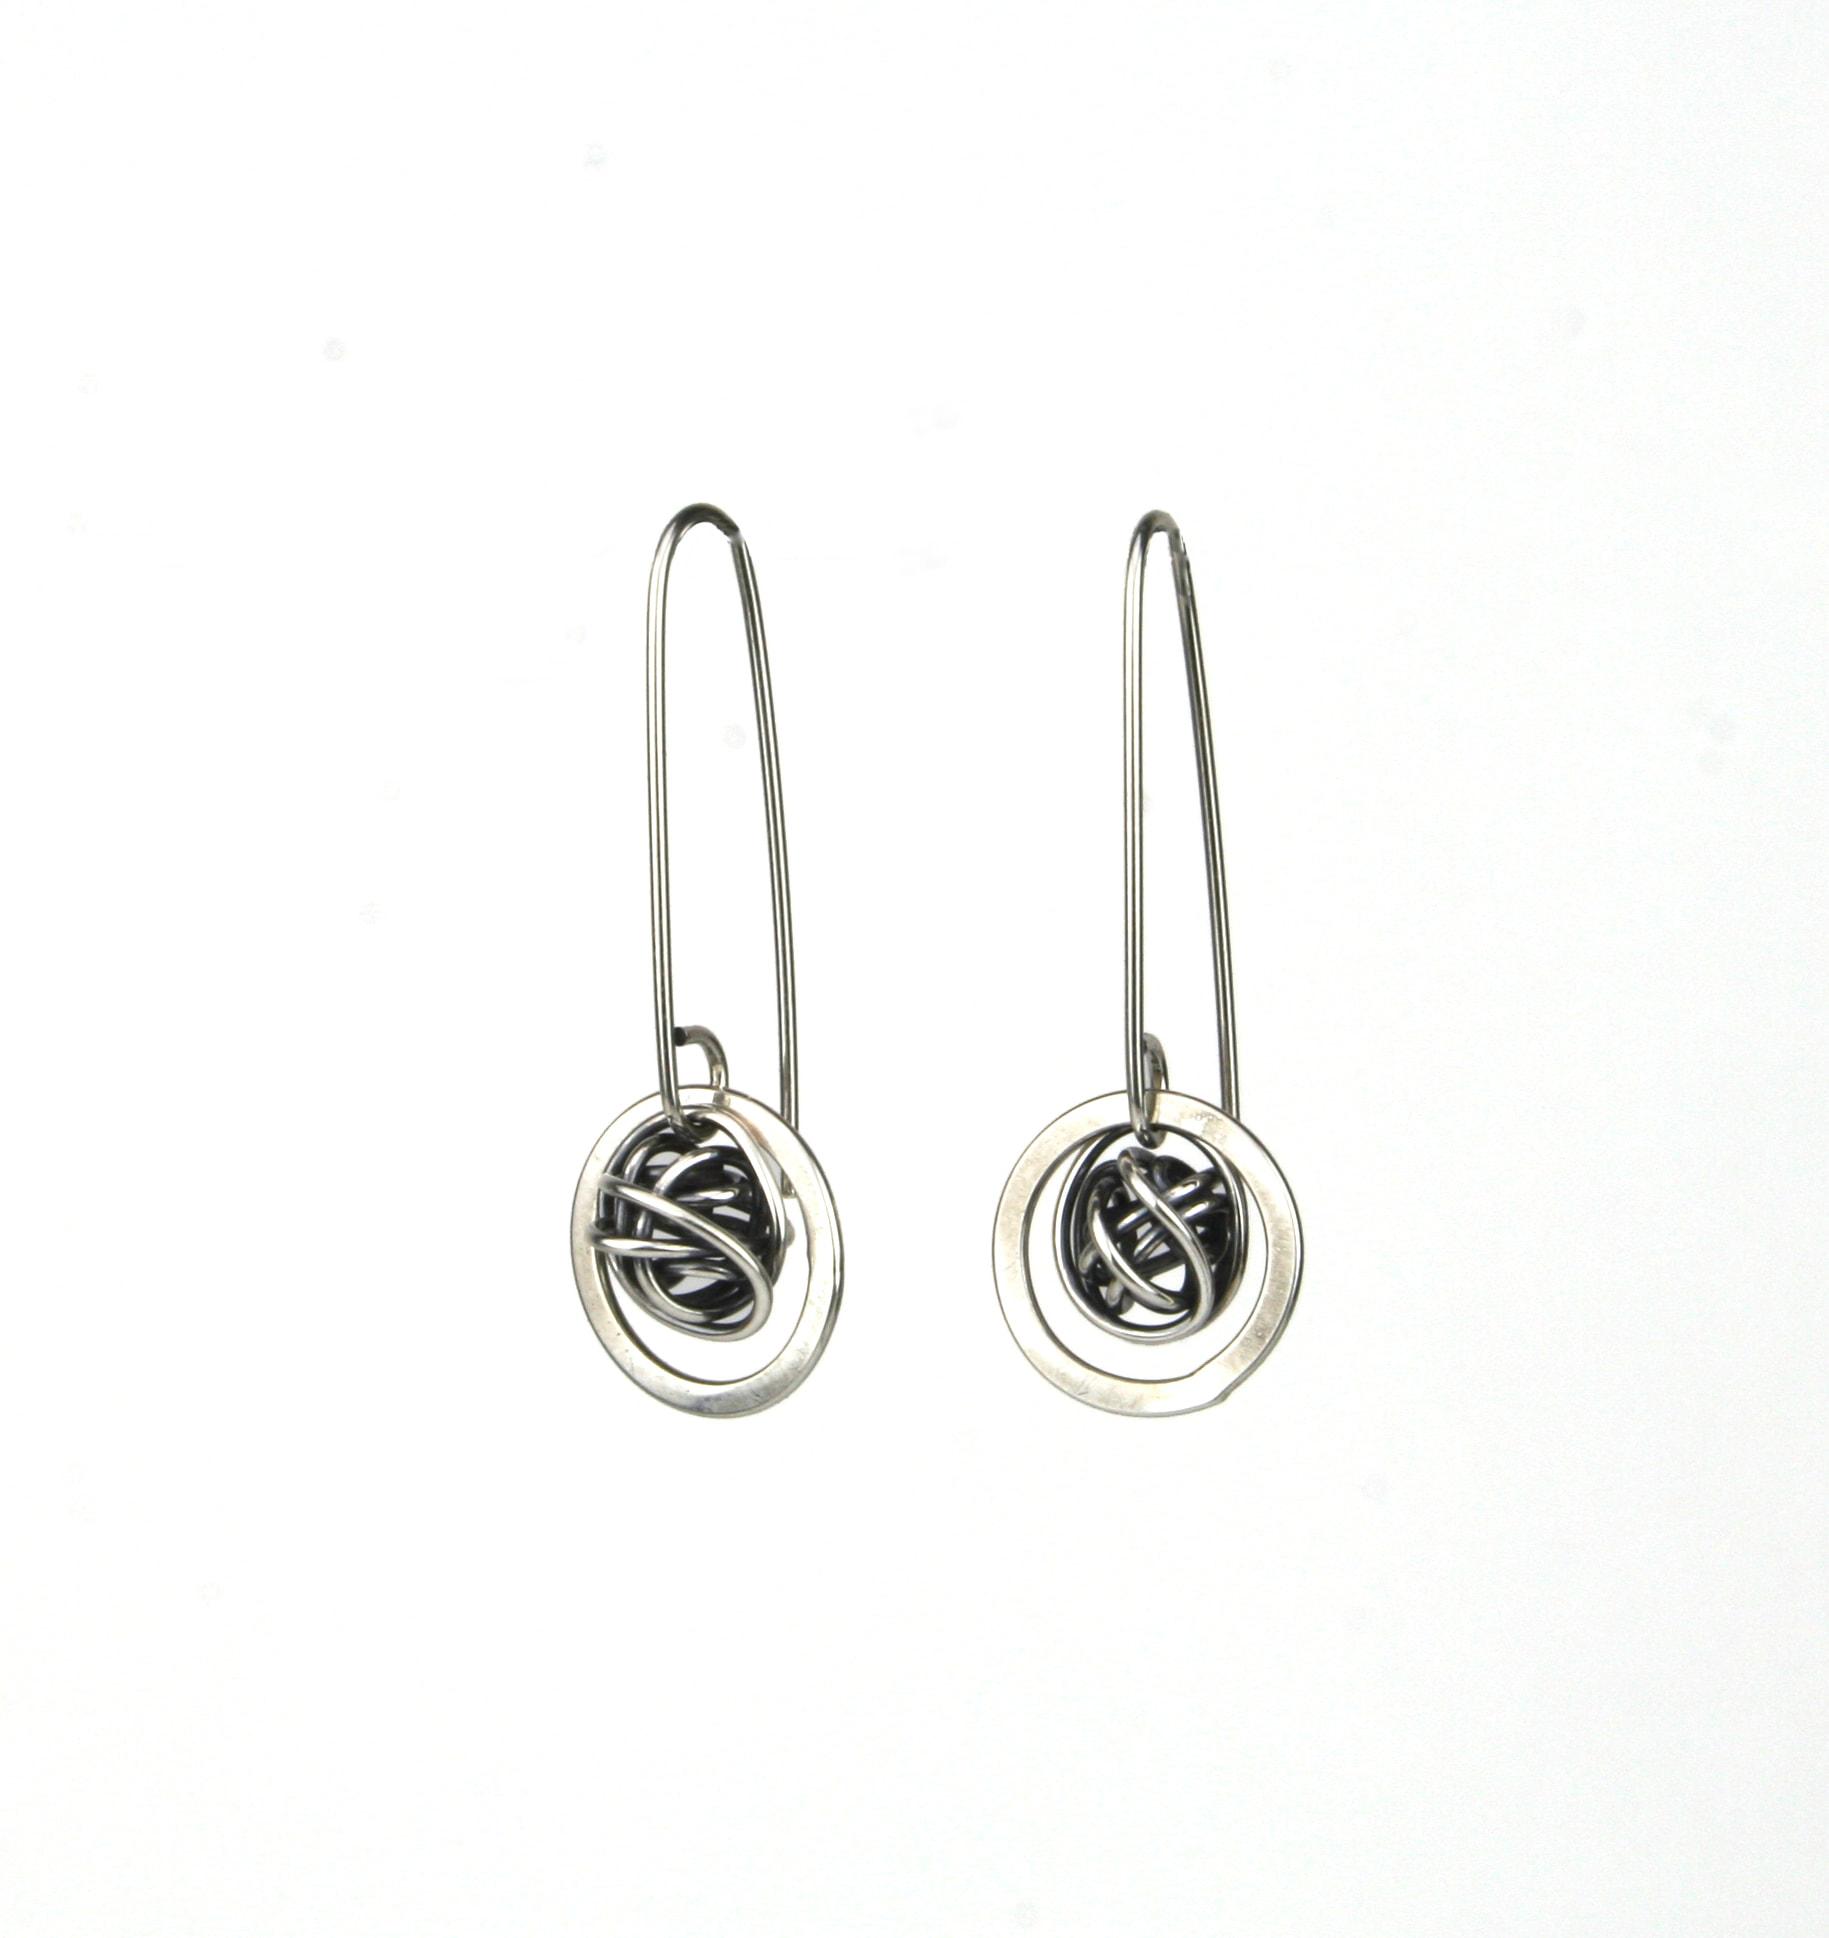 Saturn Earrings In Oxidized Silver Oxidized Copper Or